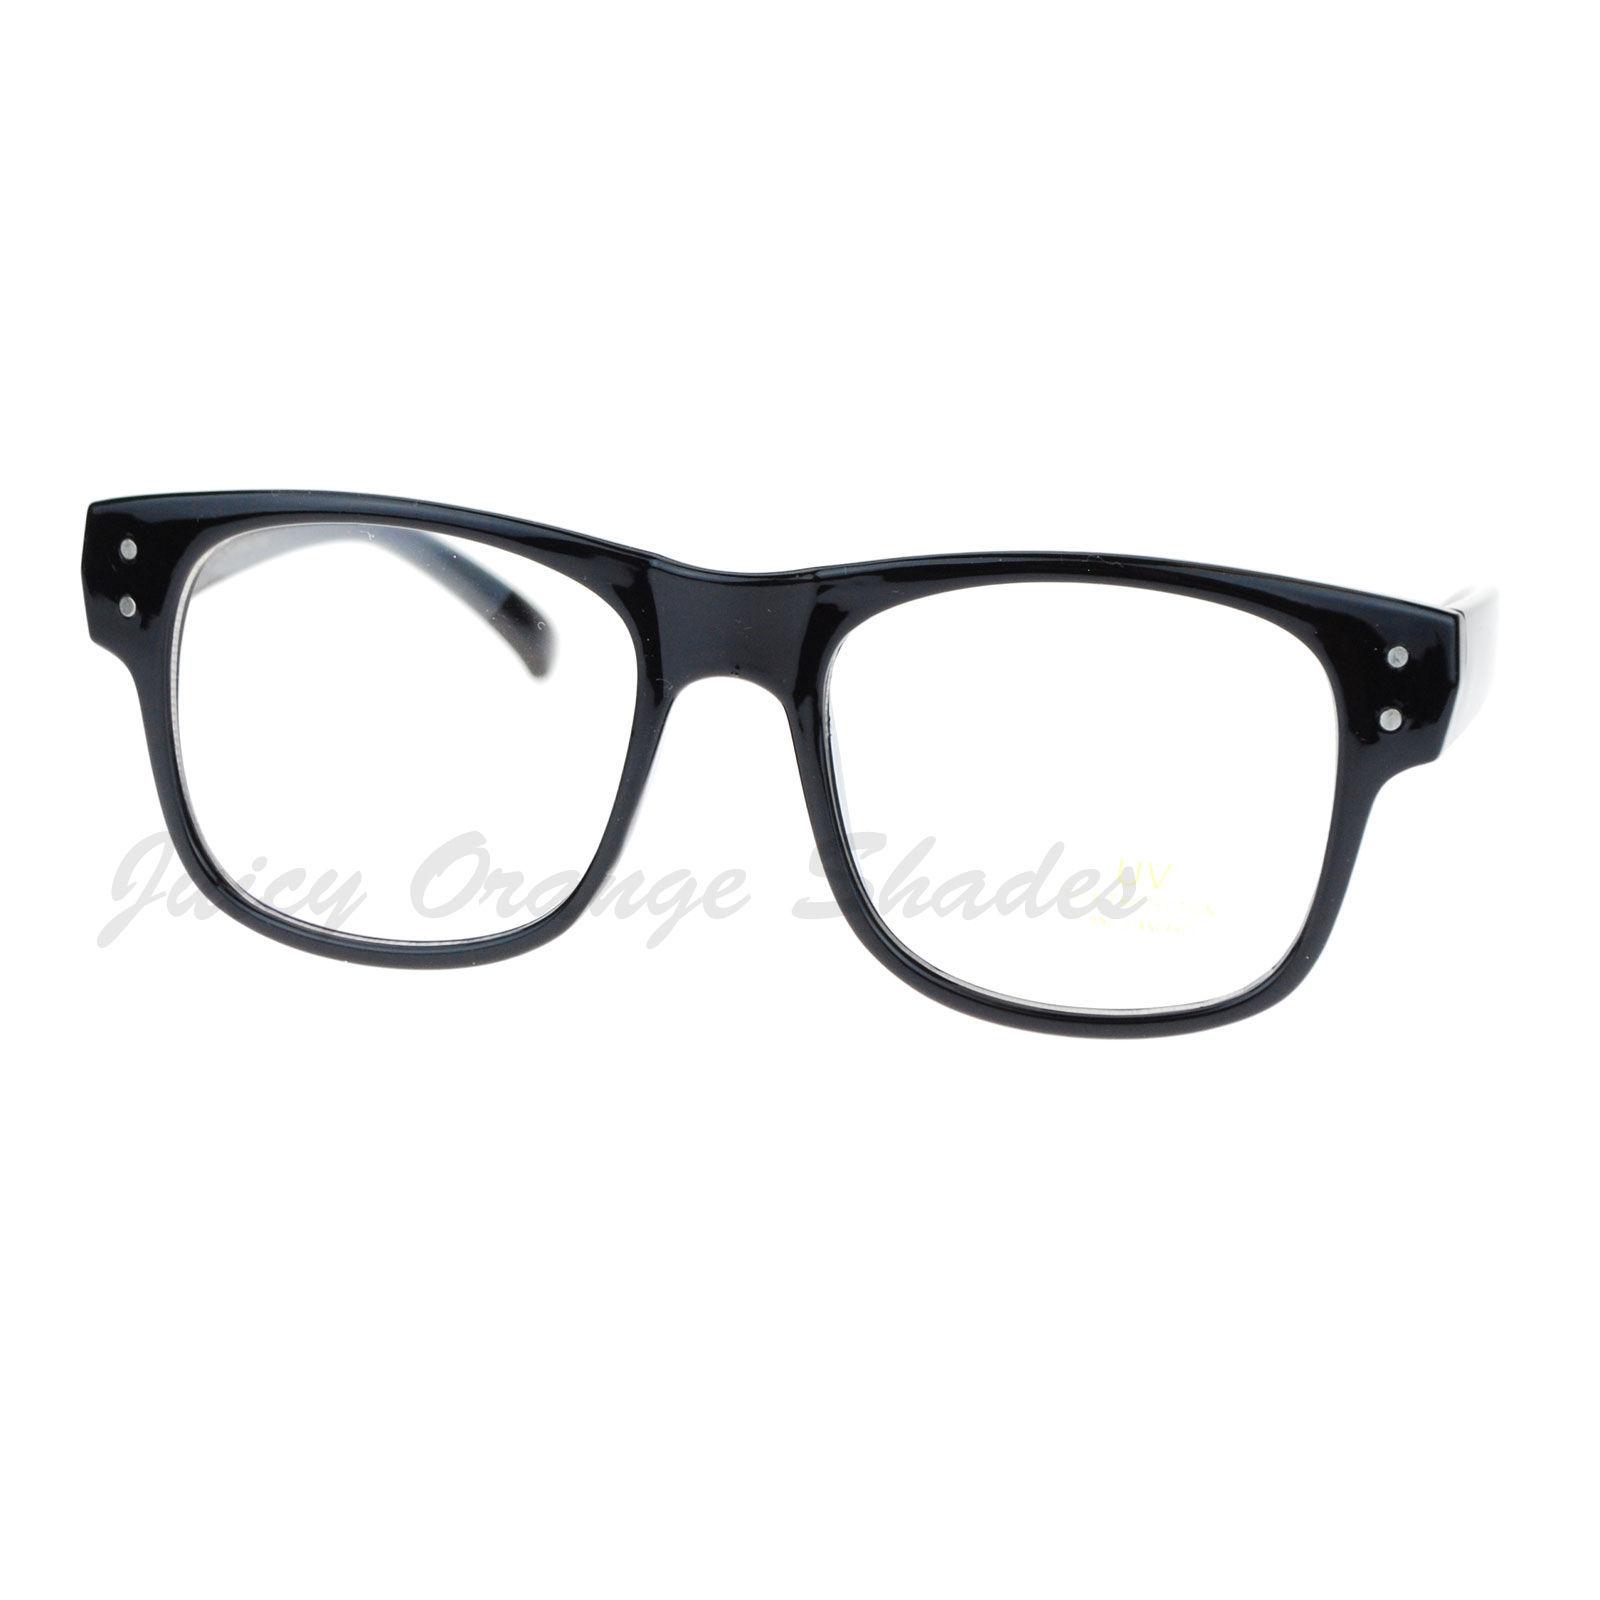 Square Frame Clear Lens Eyeglasses Nerdy Fashion Glasses ...